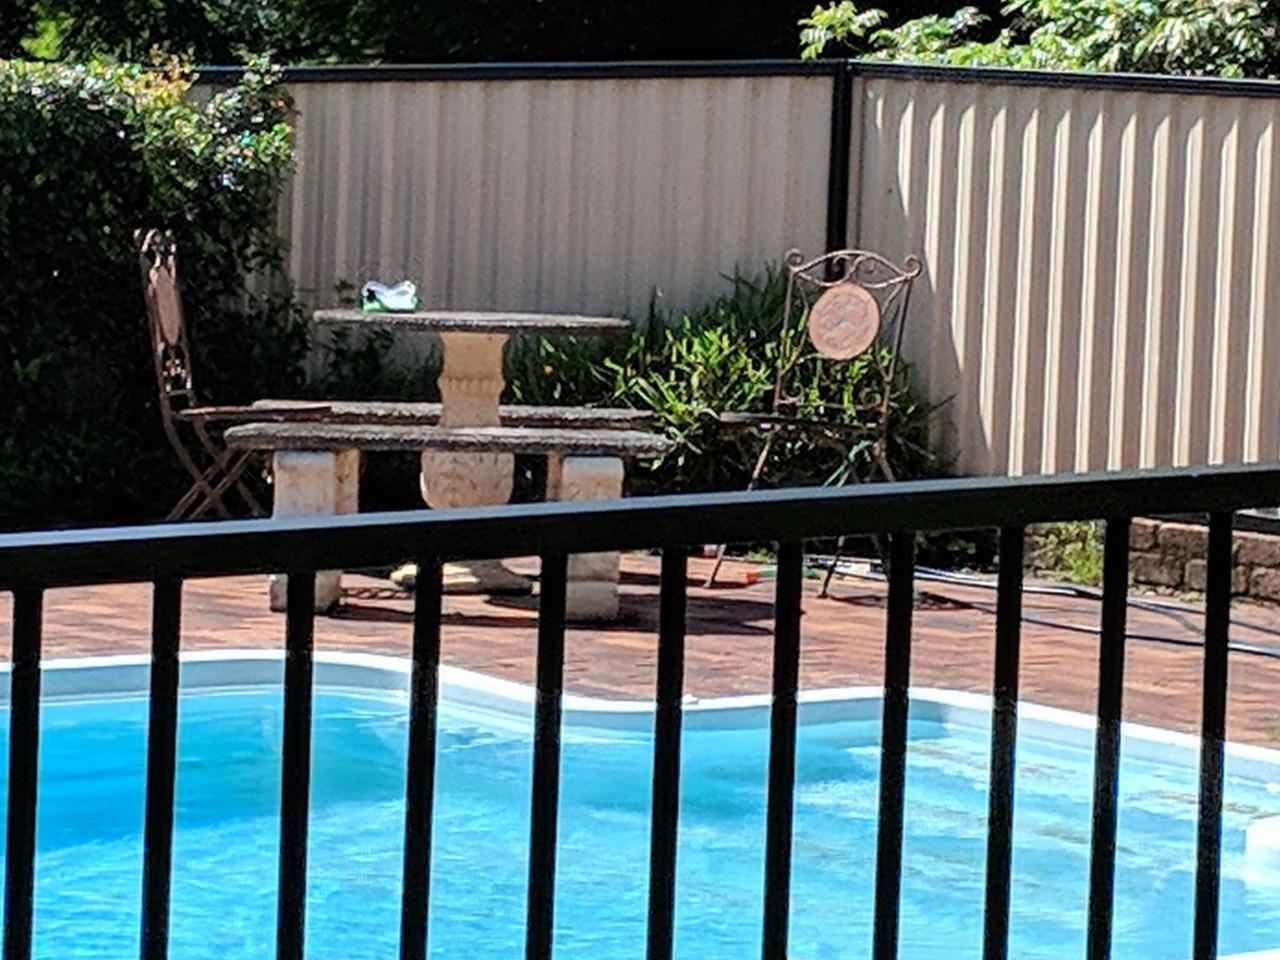 Great Pool Fence Deal - Fence Guru Australia Wide Black Aluminium Pool Fence Package Deal!